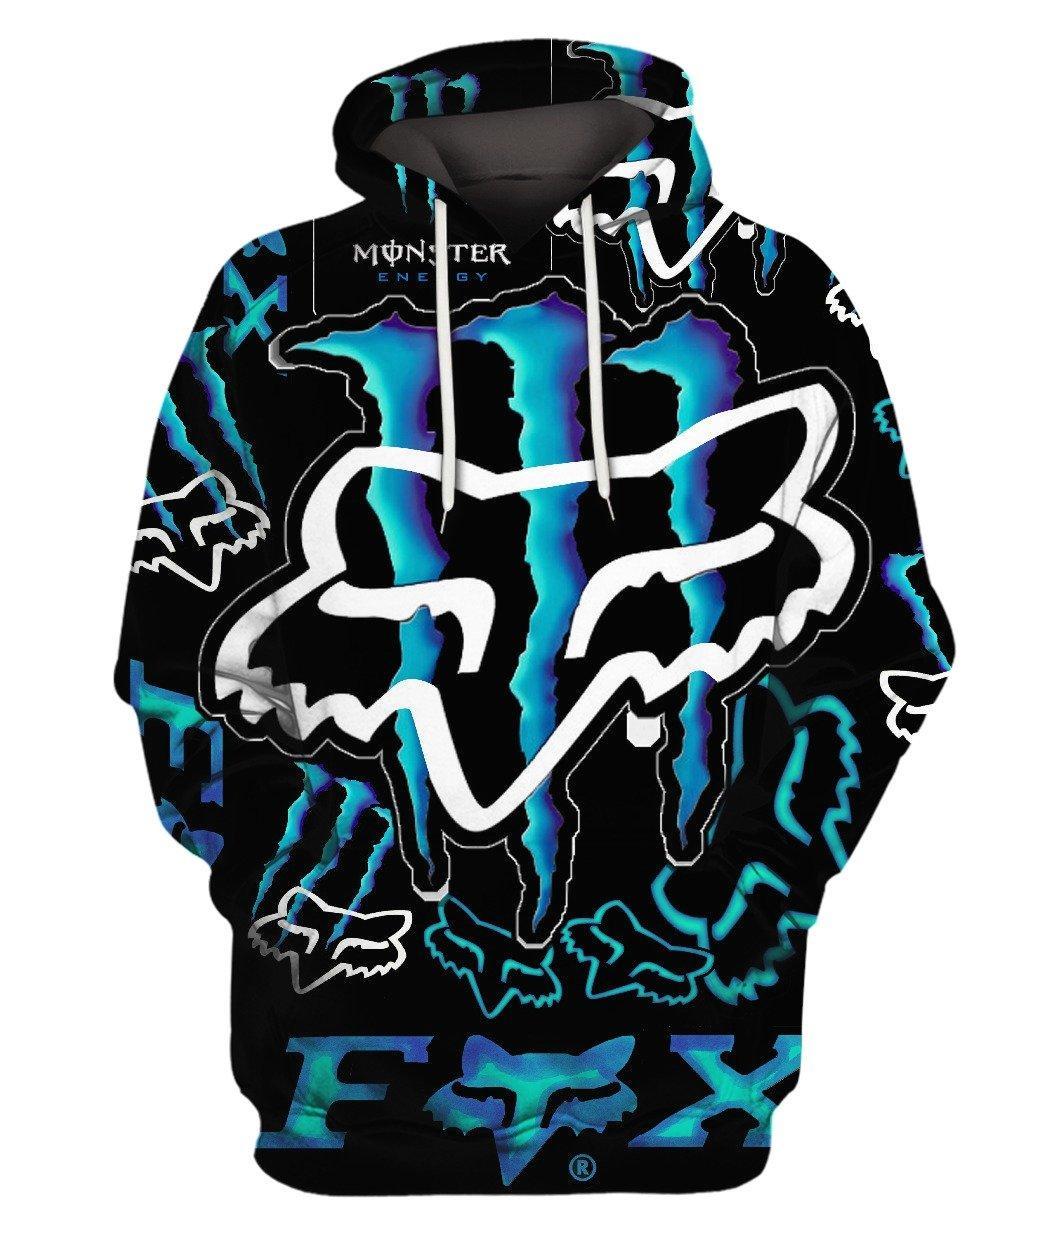 Fox Monster Energy Blue 3d Full Print Hoodie 3d Graphic Printed Tshirt Hoodie Up To 5xl